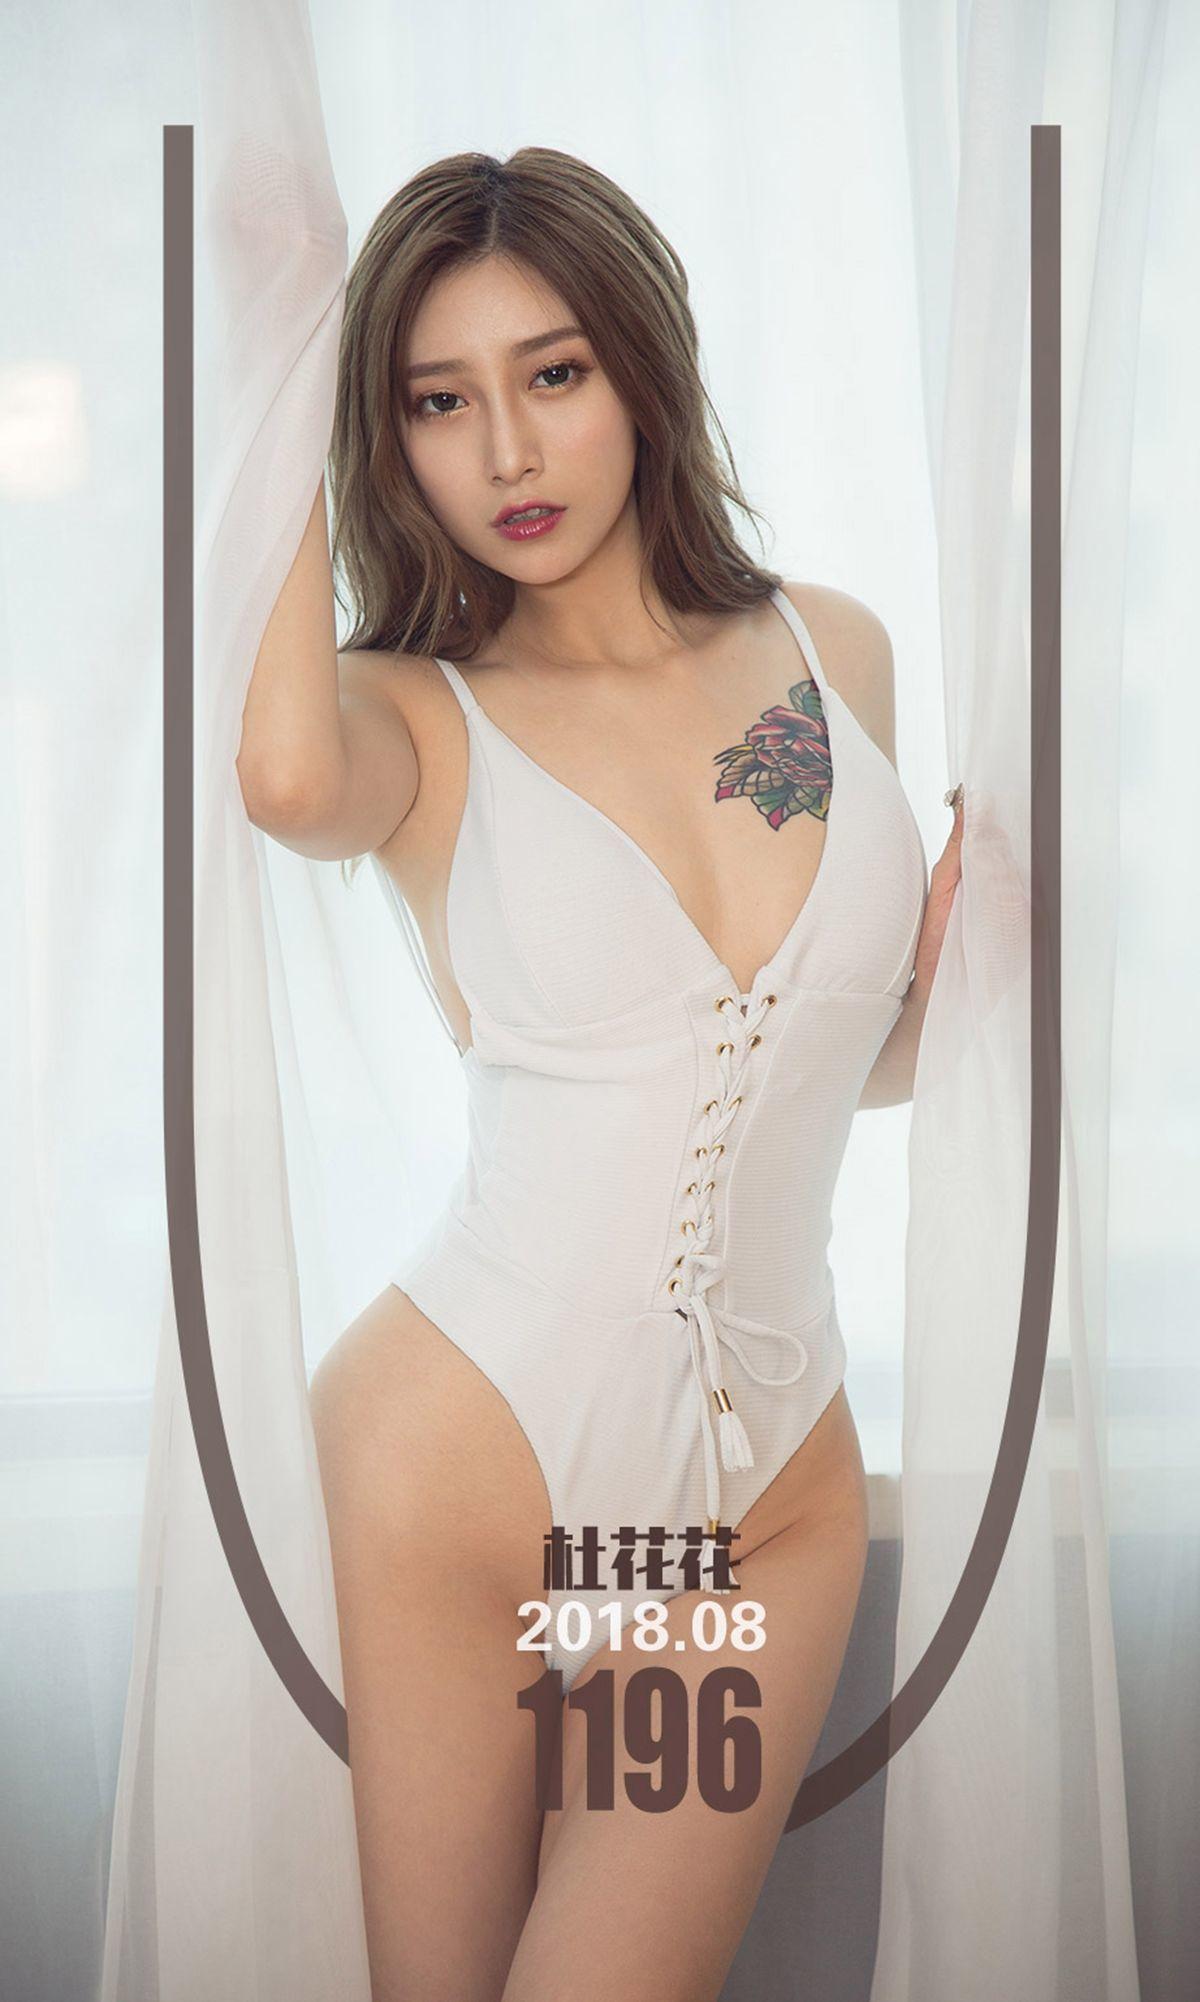 [Ugirls尤果圈] No.1196 杜花花 - 花枝招展 写真套图